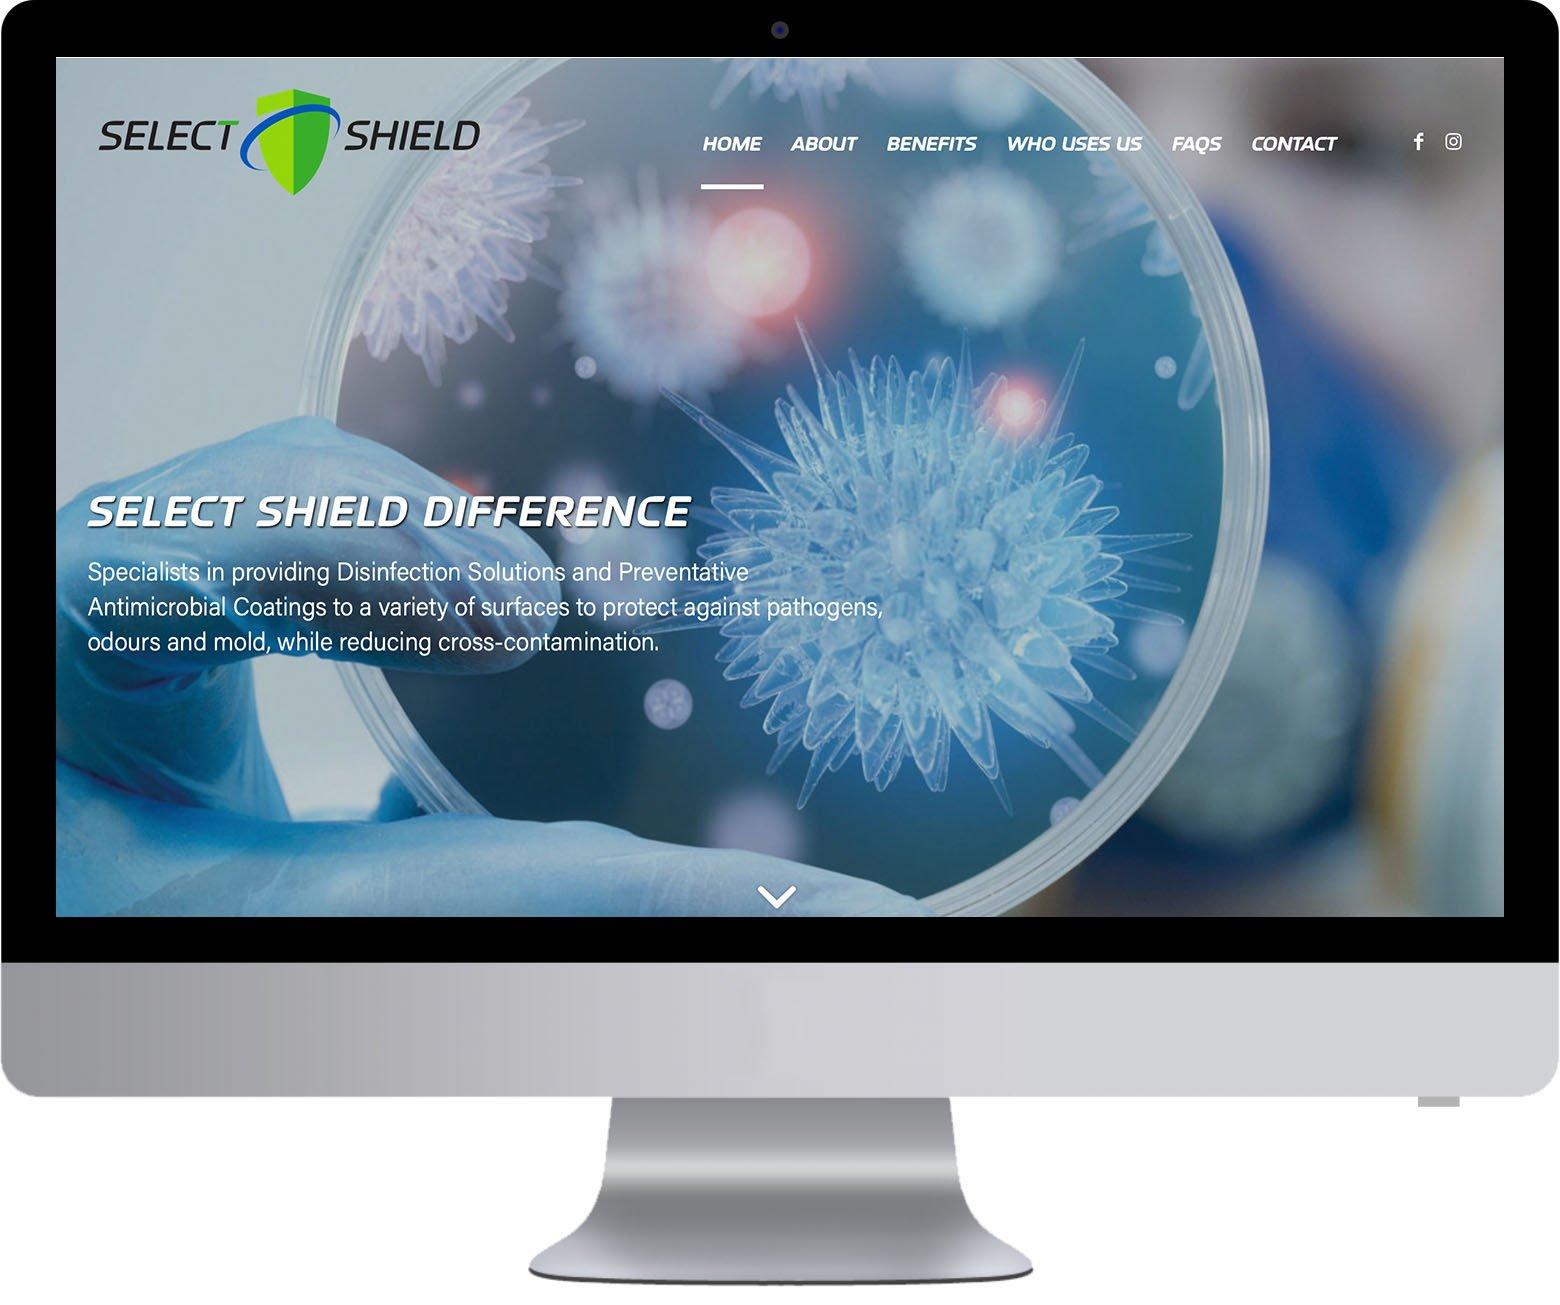 Richmond WordPress Web Development - Select Shield